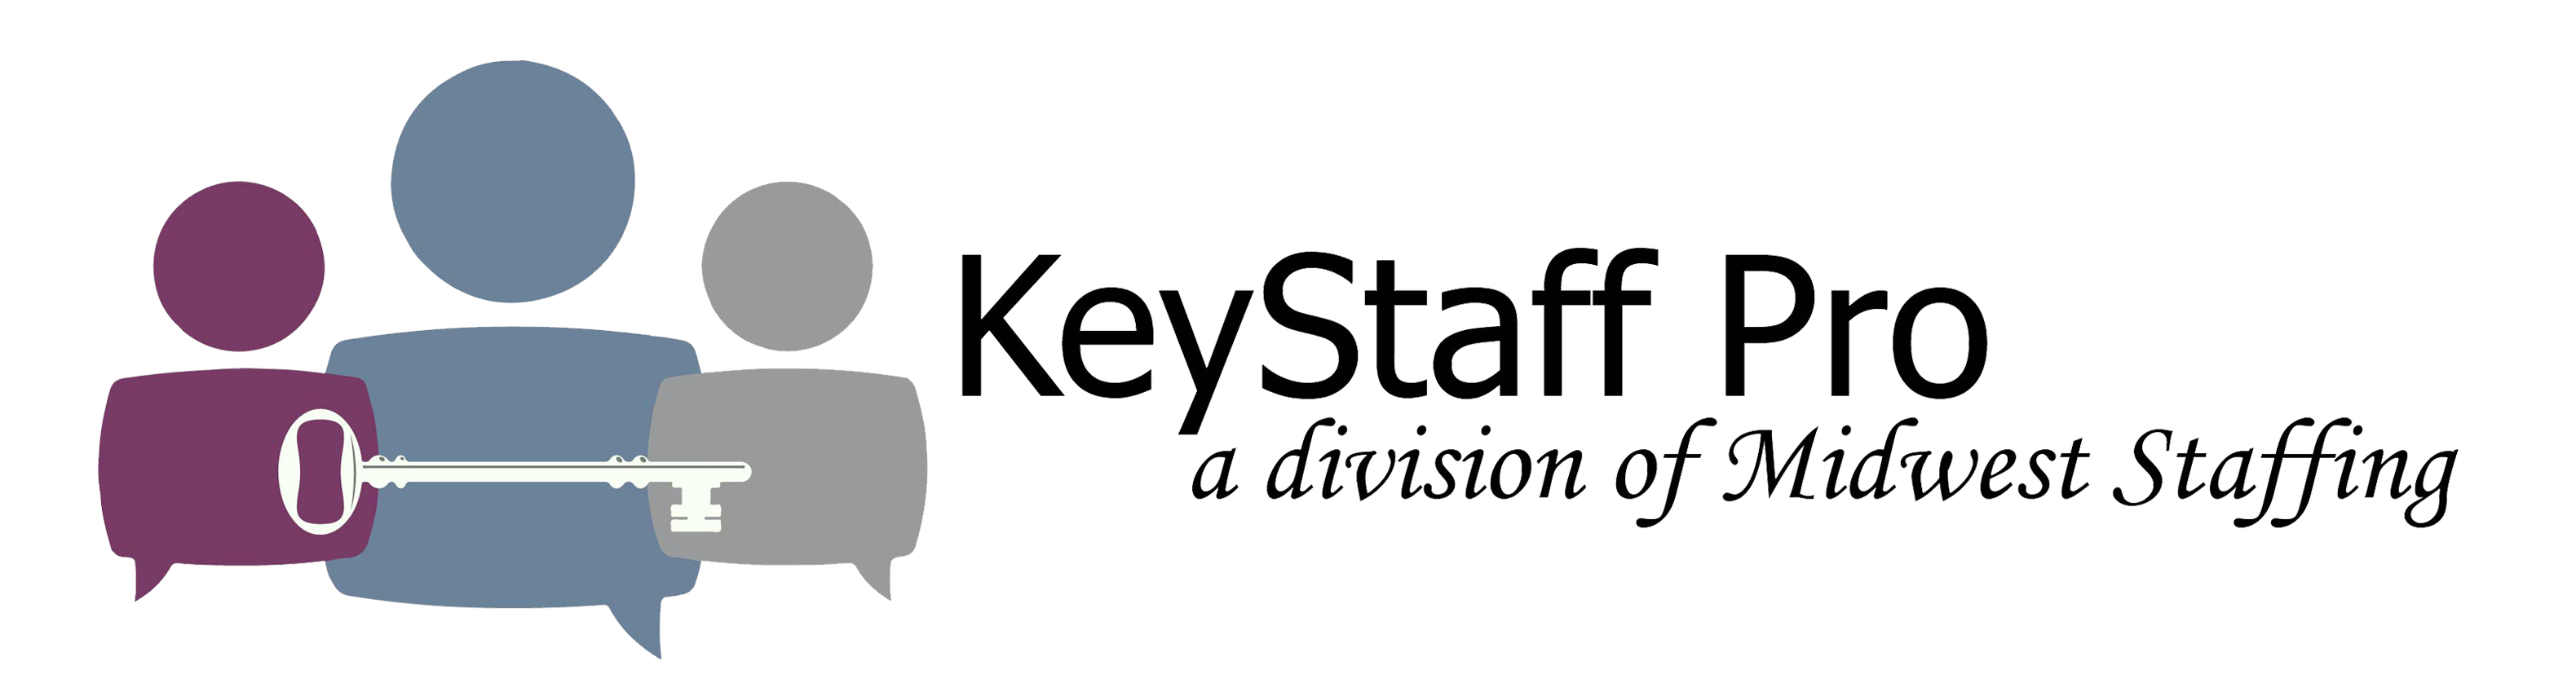 Key Staff Pro